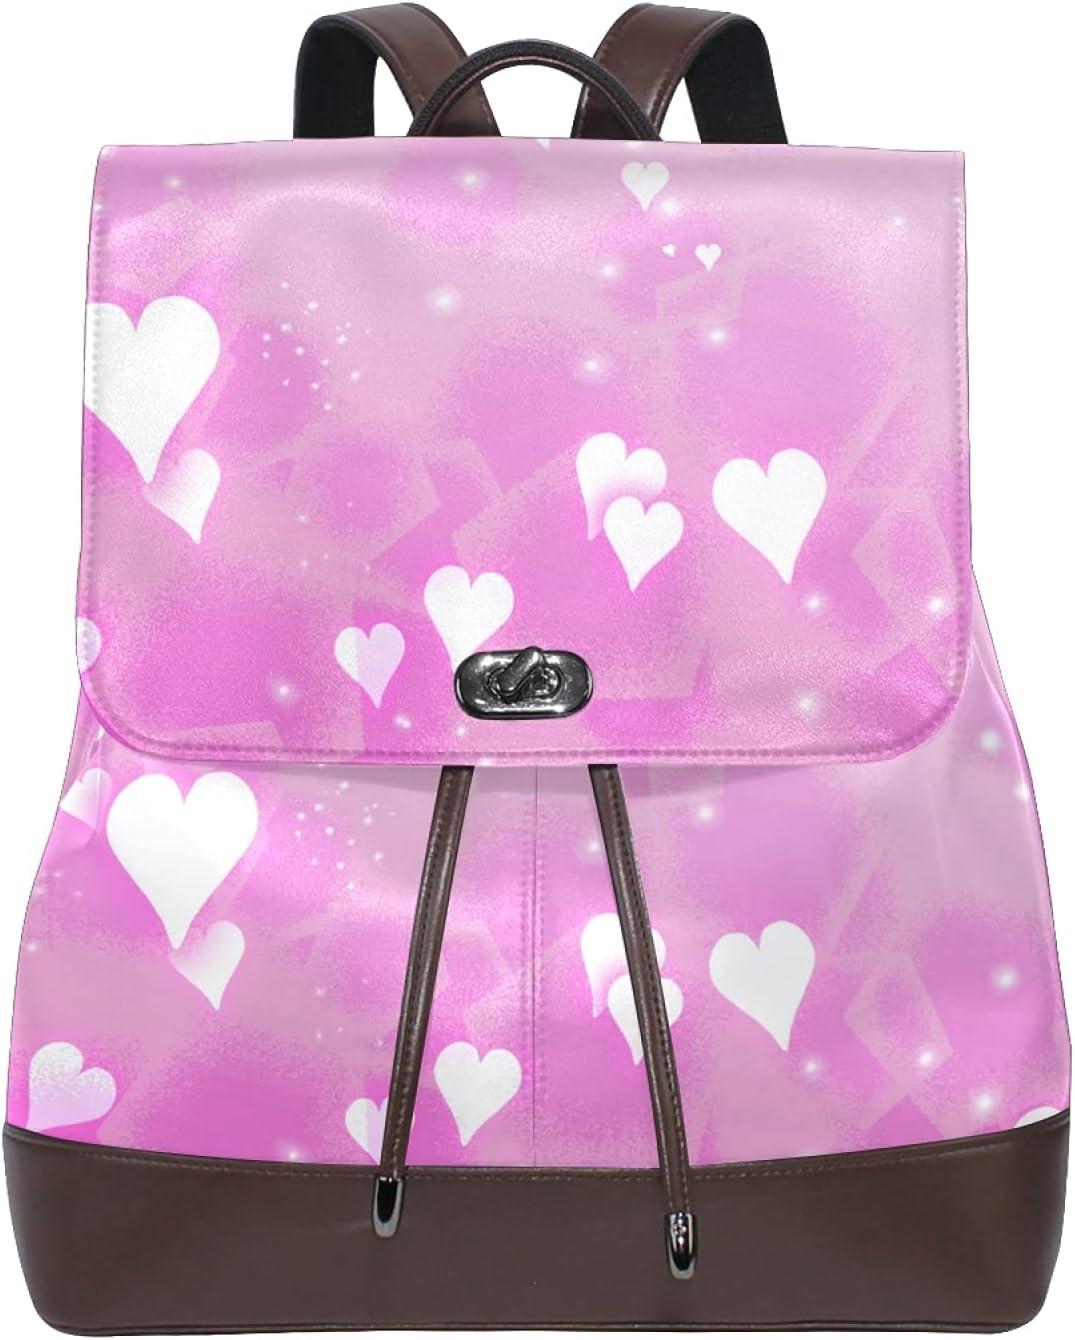 Women Leather Backpack Ladies Fashion Shoulder Bag Travel Large Finally popular brand Boston Mall